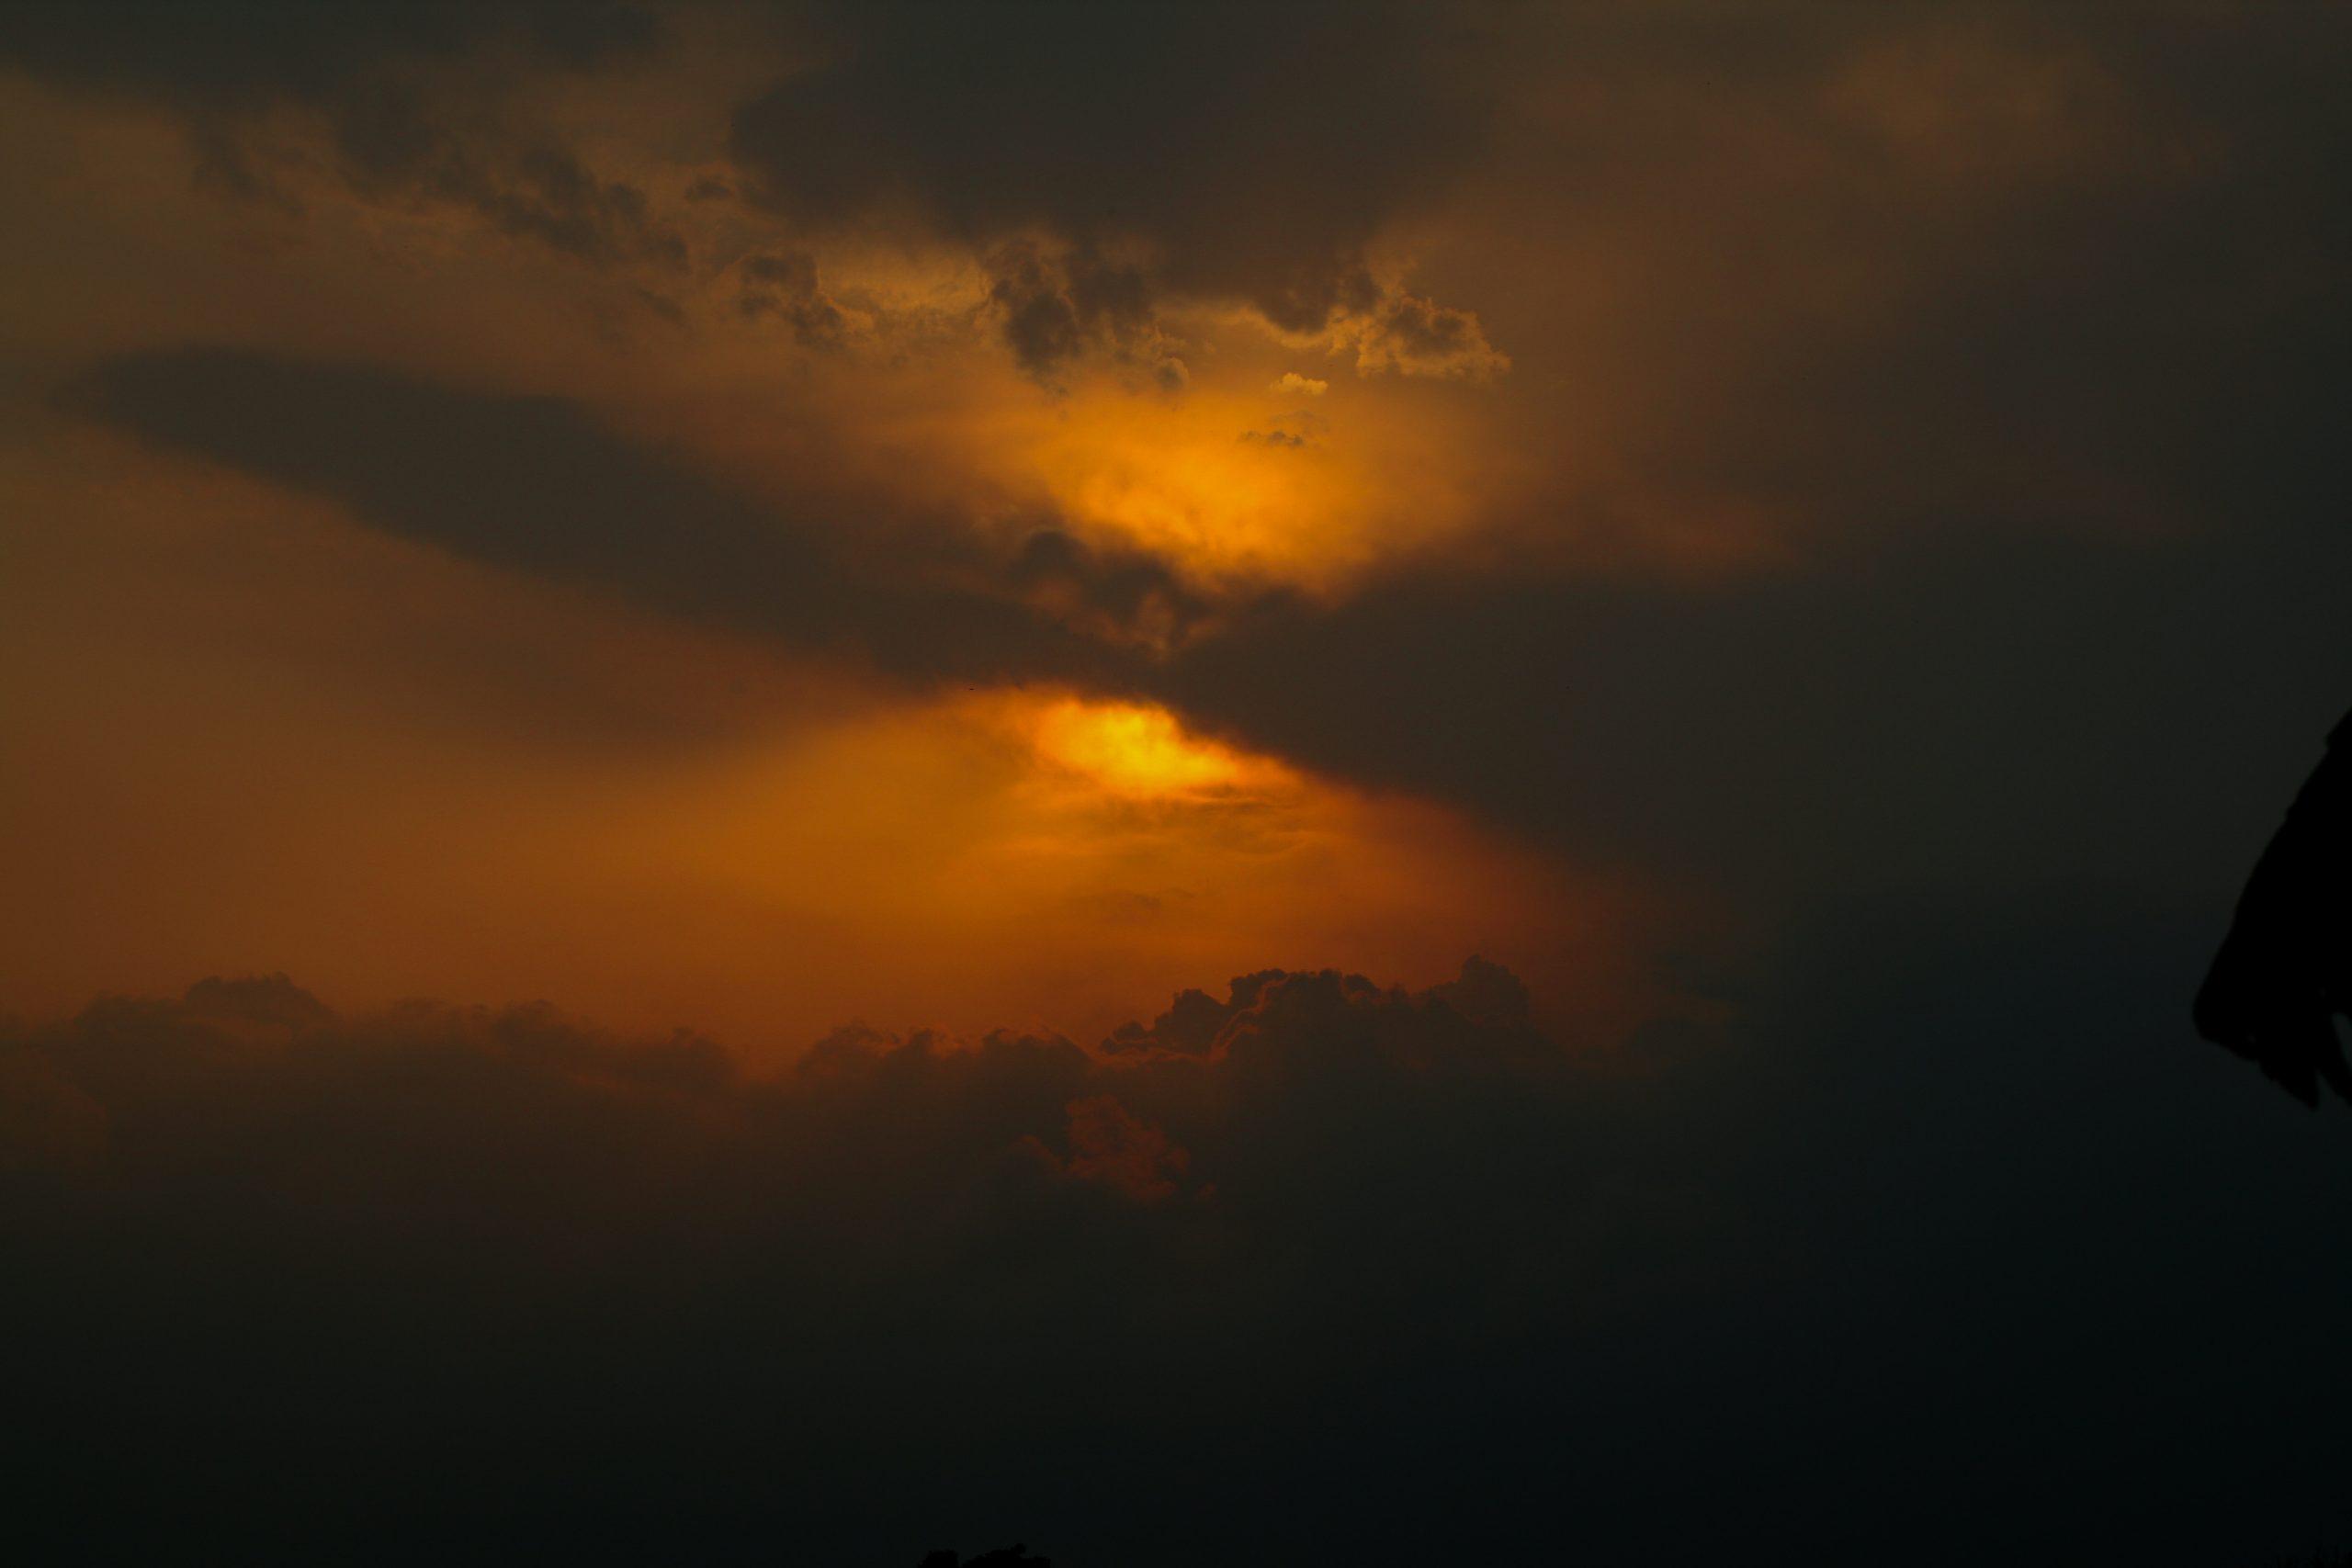 A beautiful cloudy sky